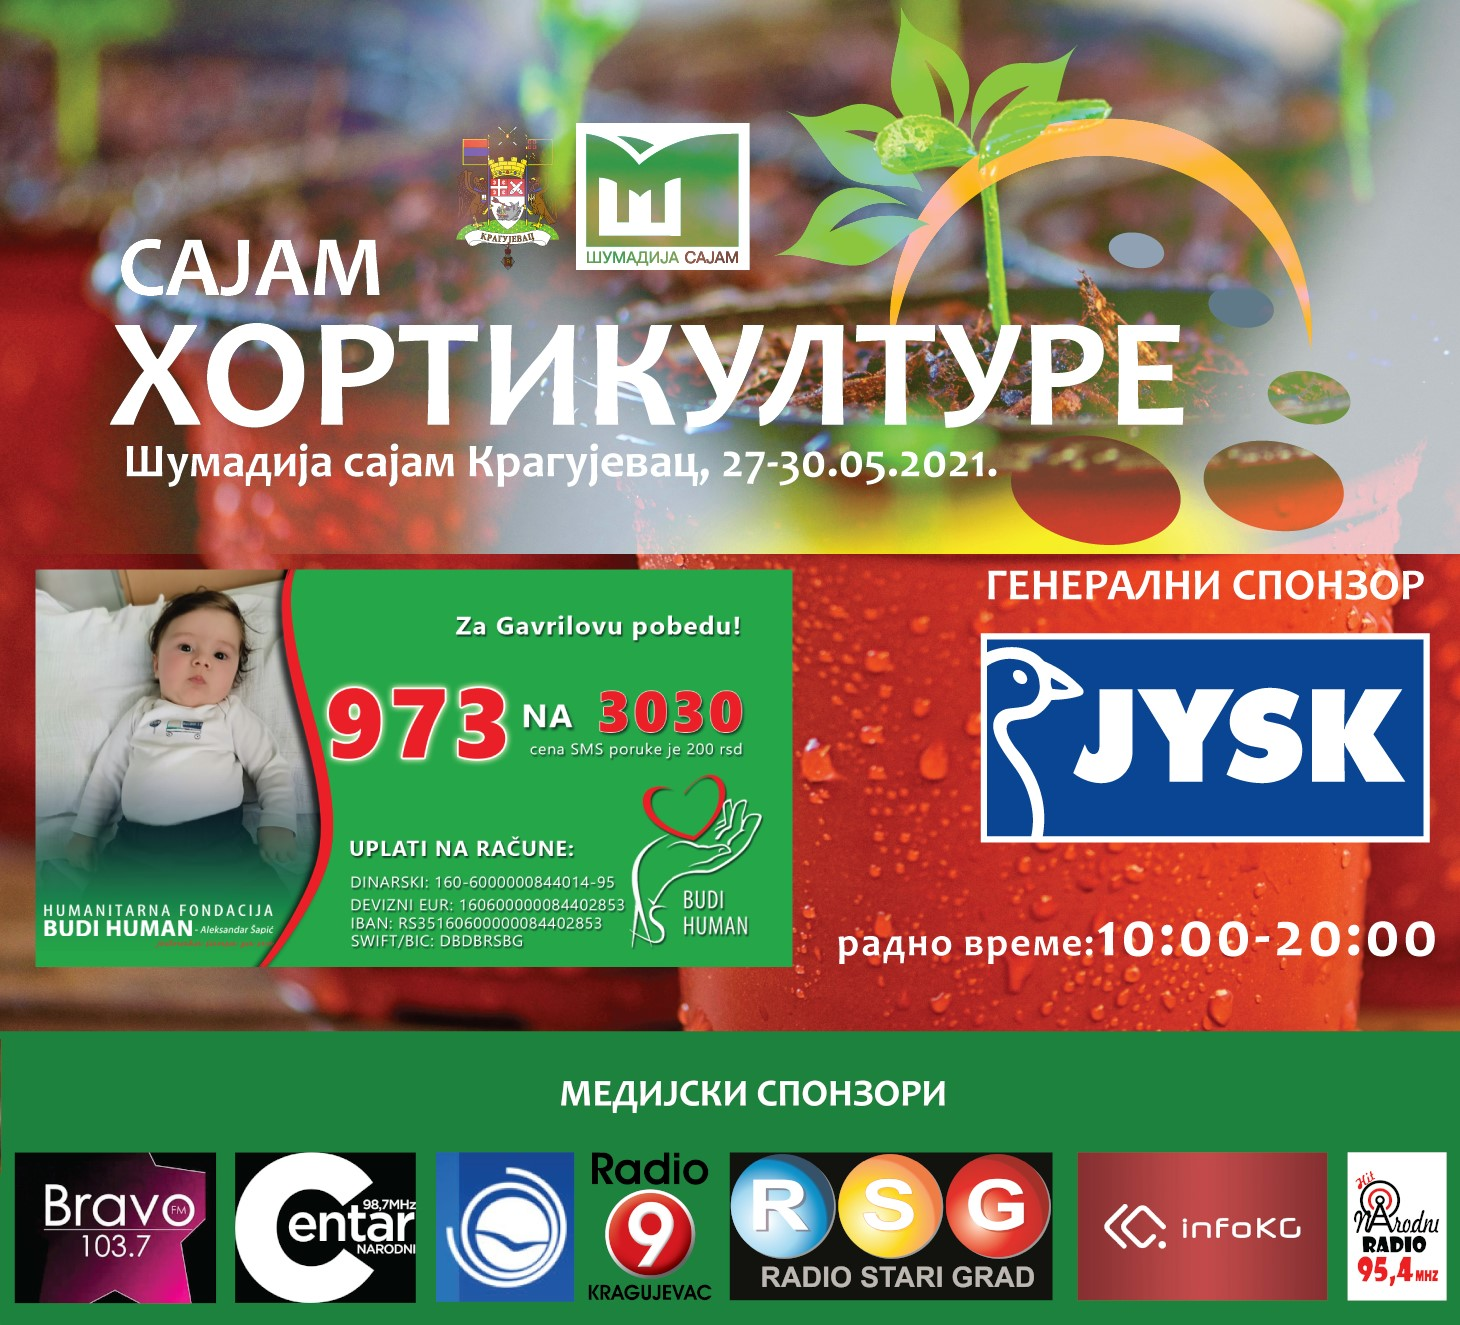 plakat-sajam-hortikulture-2021-kragujevac